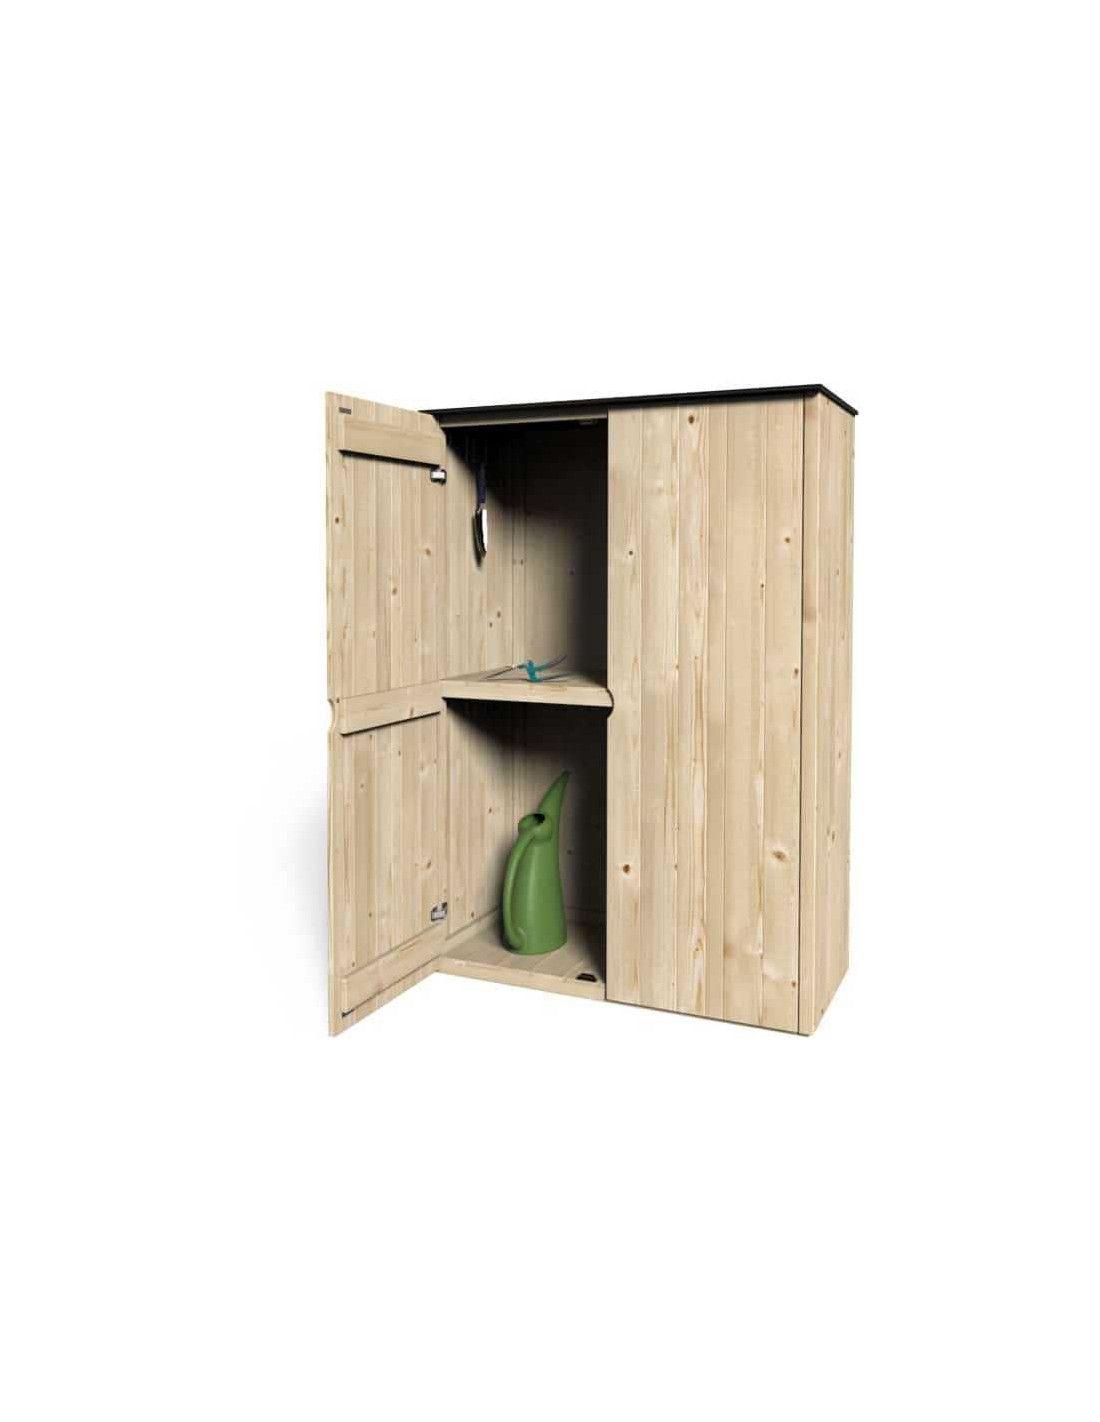 Armarios de madera exterior prefabricados modelo etesio for Armario jardin madera